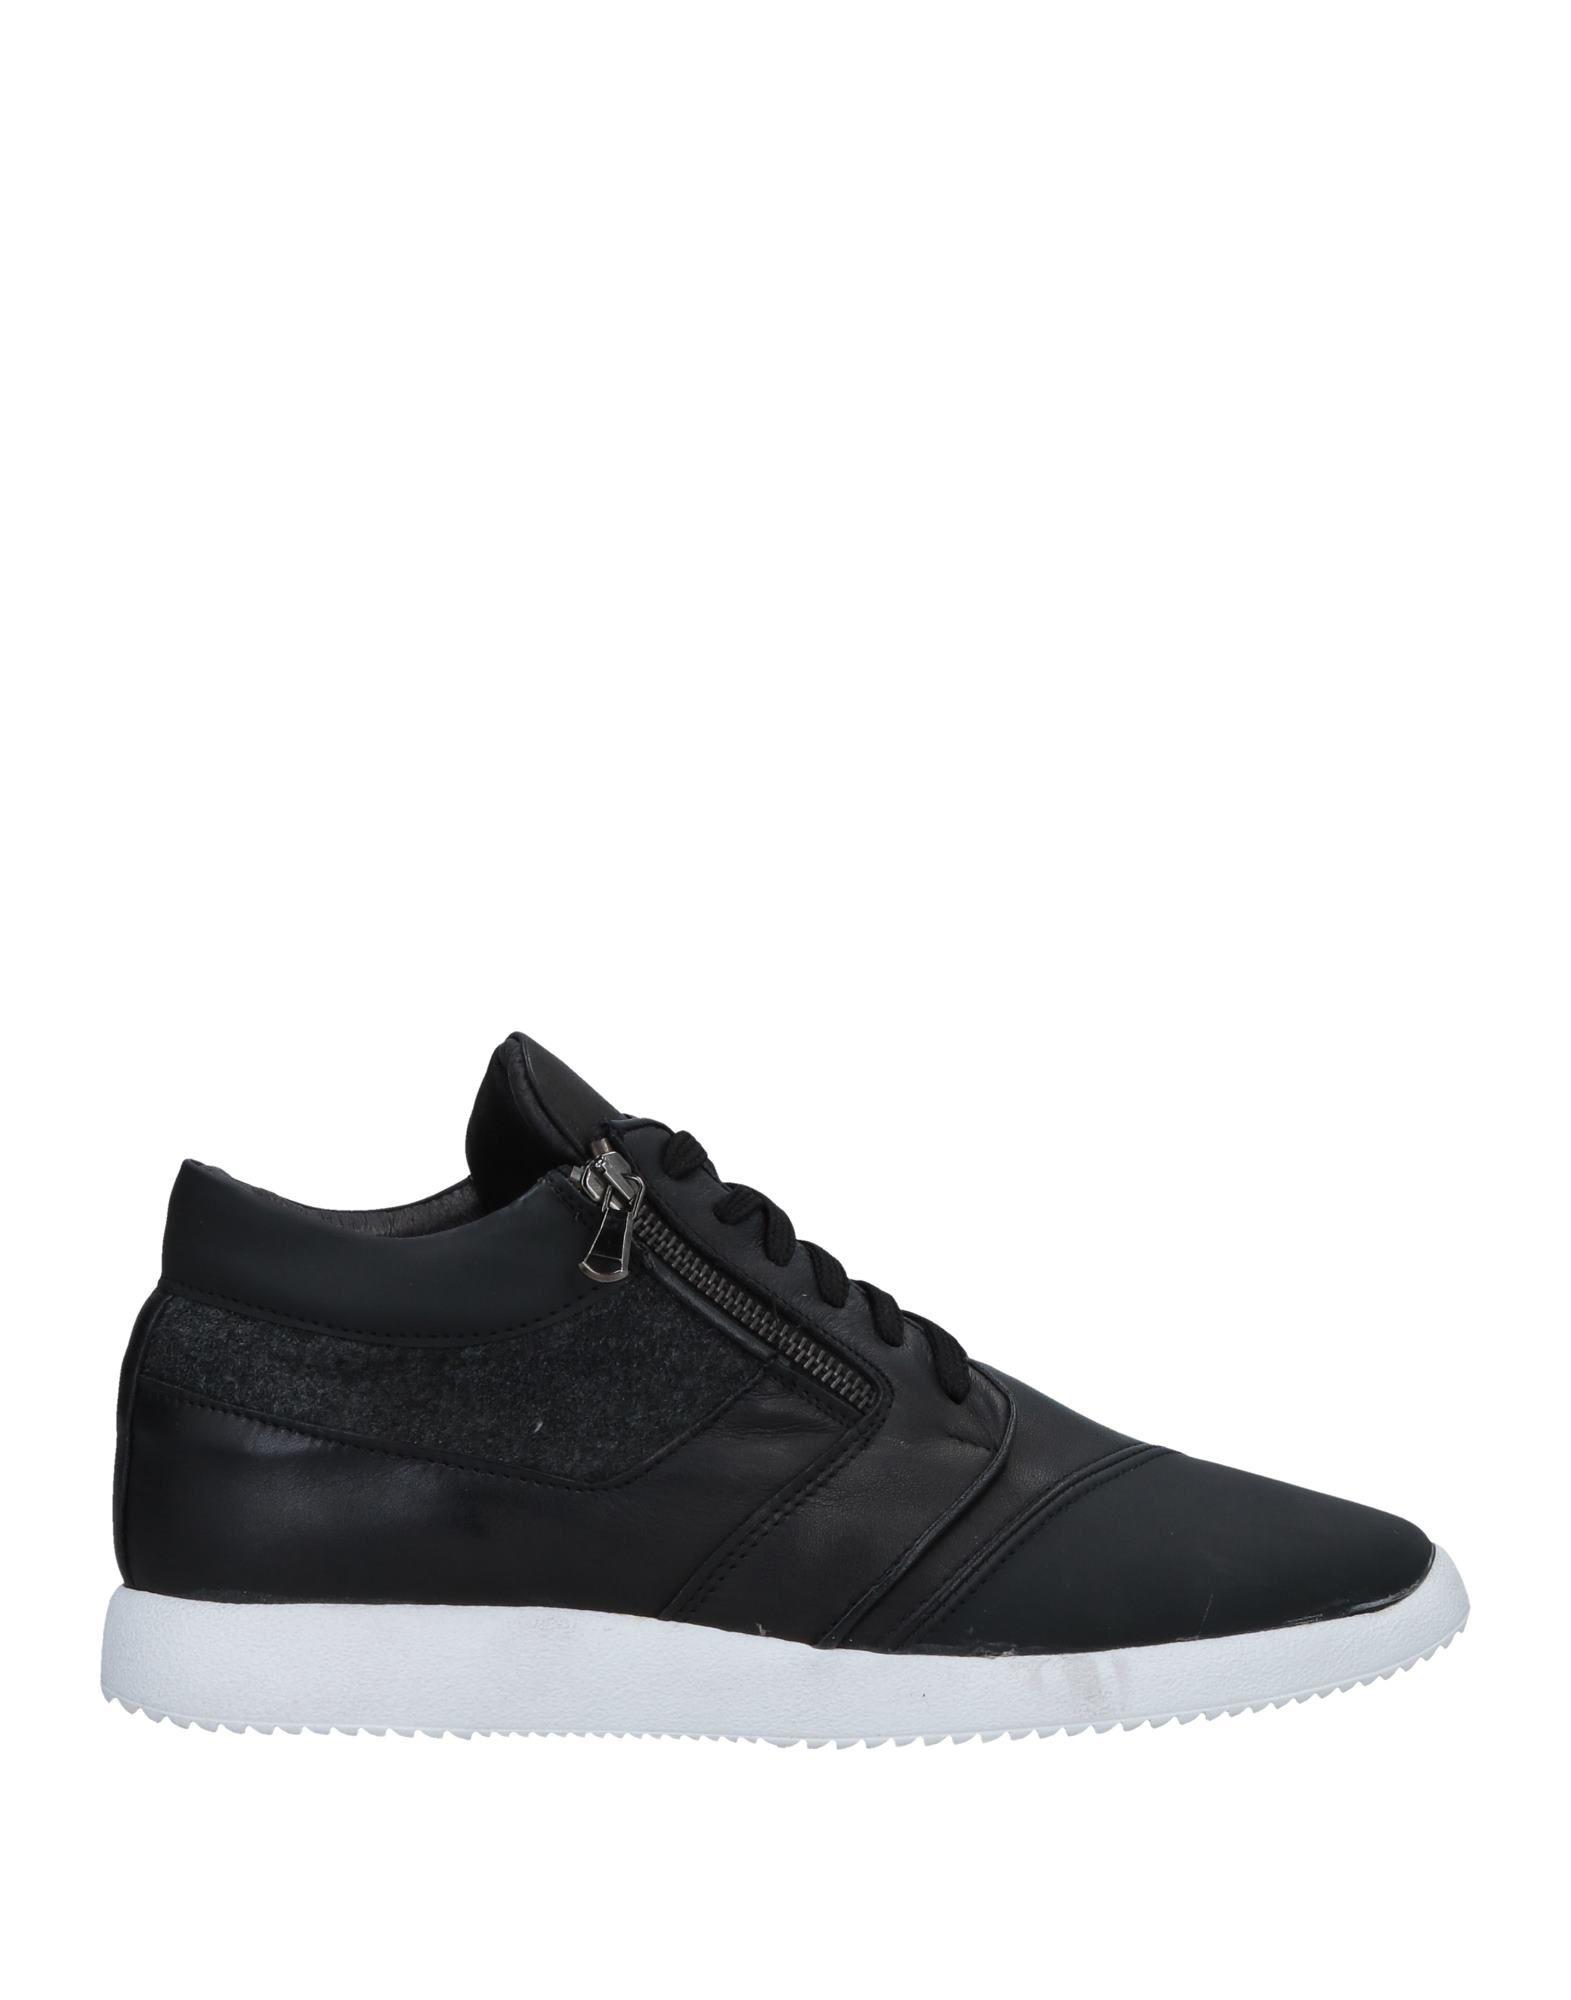 Moda Sneakers Bagatt Uomo - 11505855VH